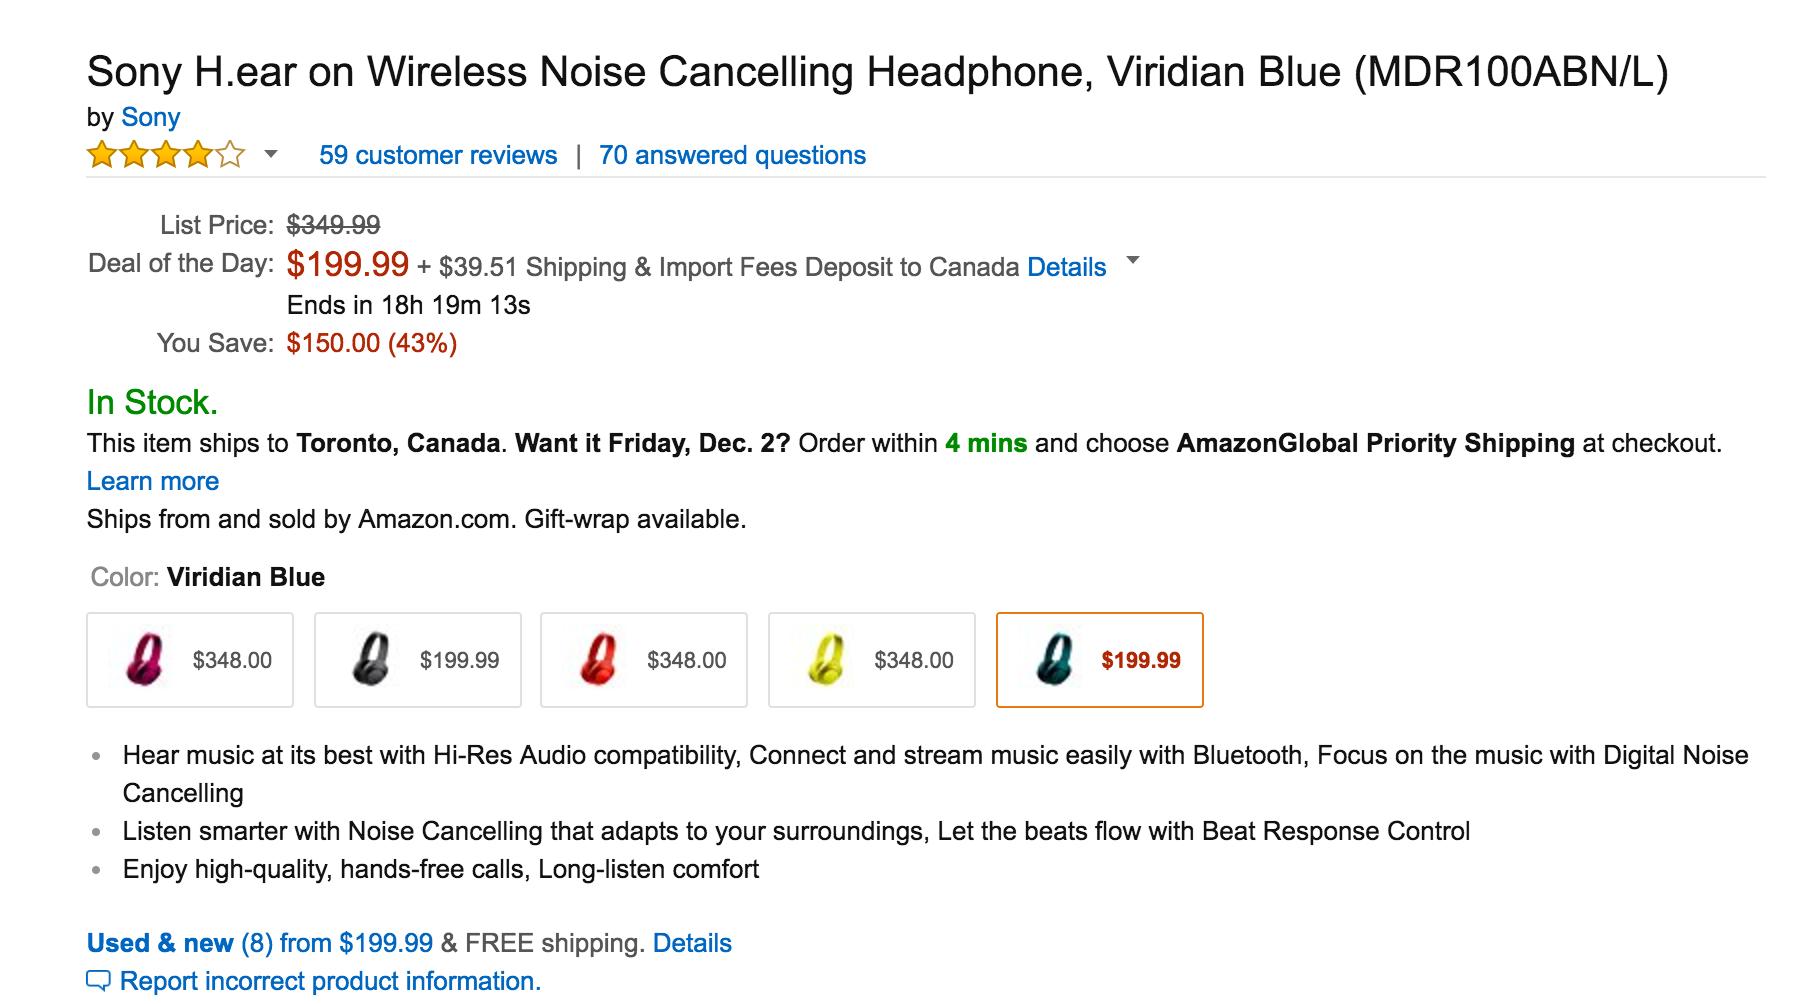 sony-h-ear-wireless-noise-cancelling-headphones-4